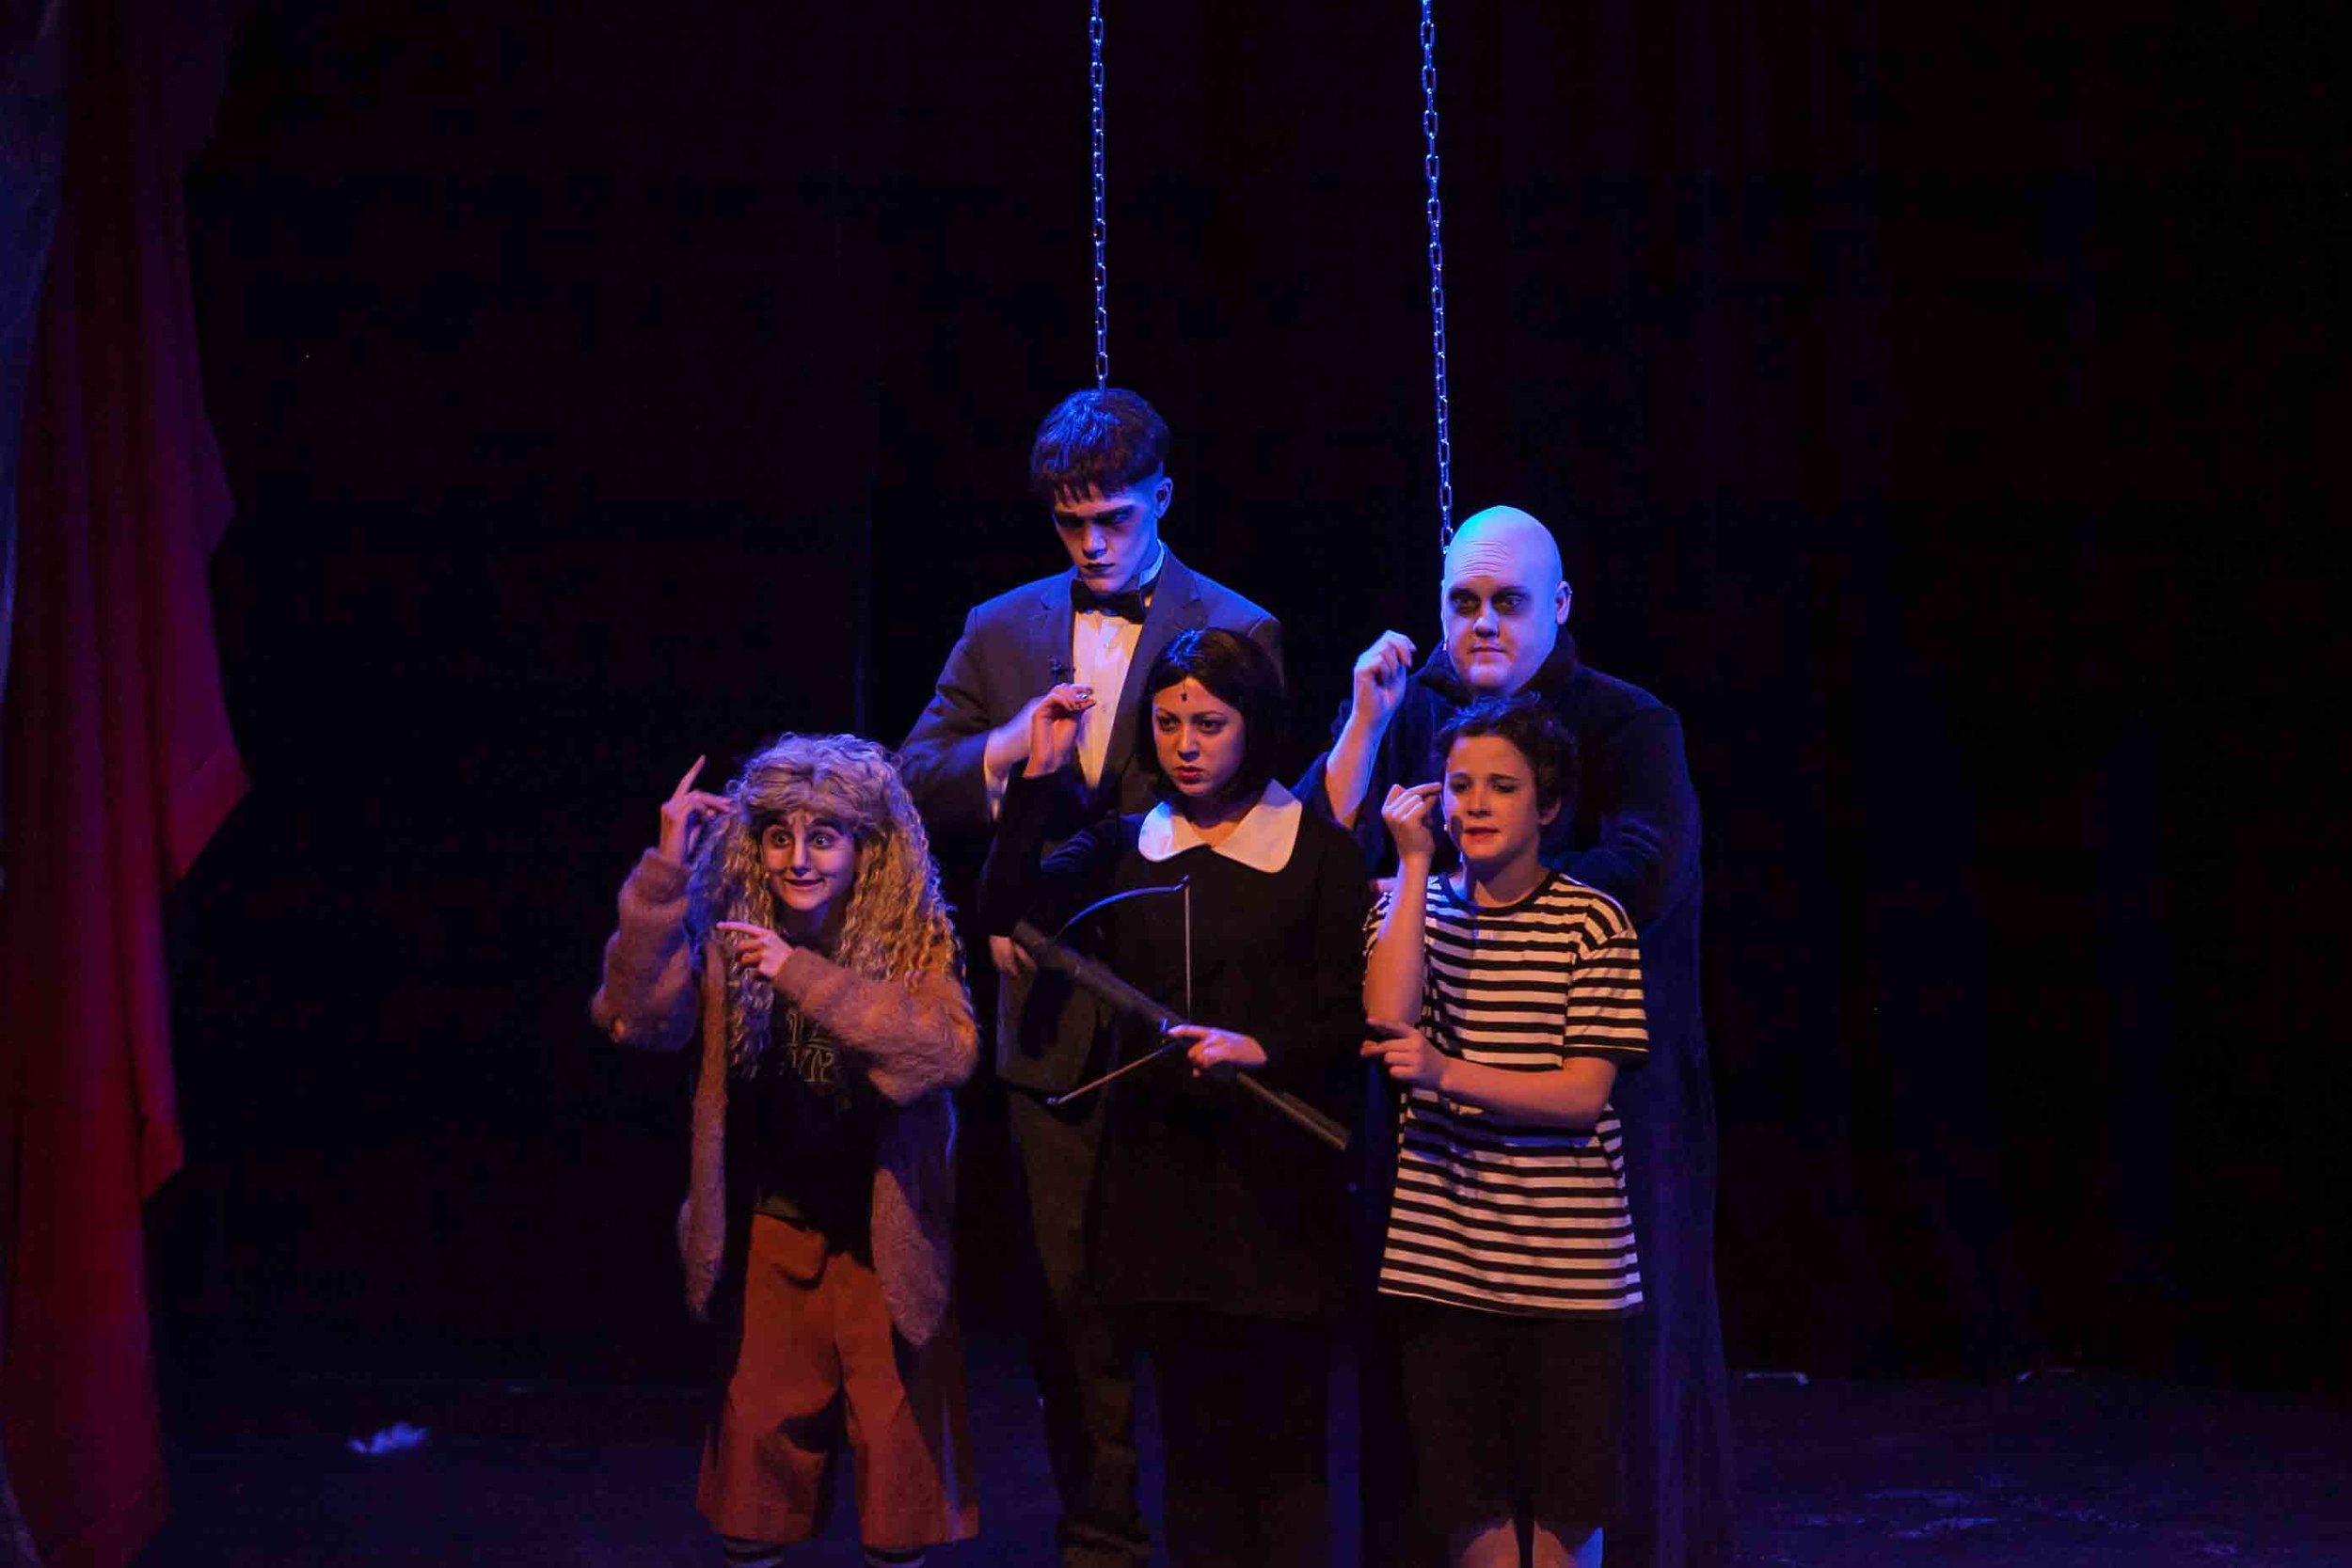 6-19-16 Addams Family Creepy Cast 0017.jpg